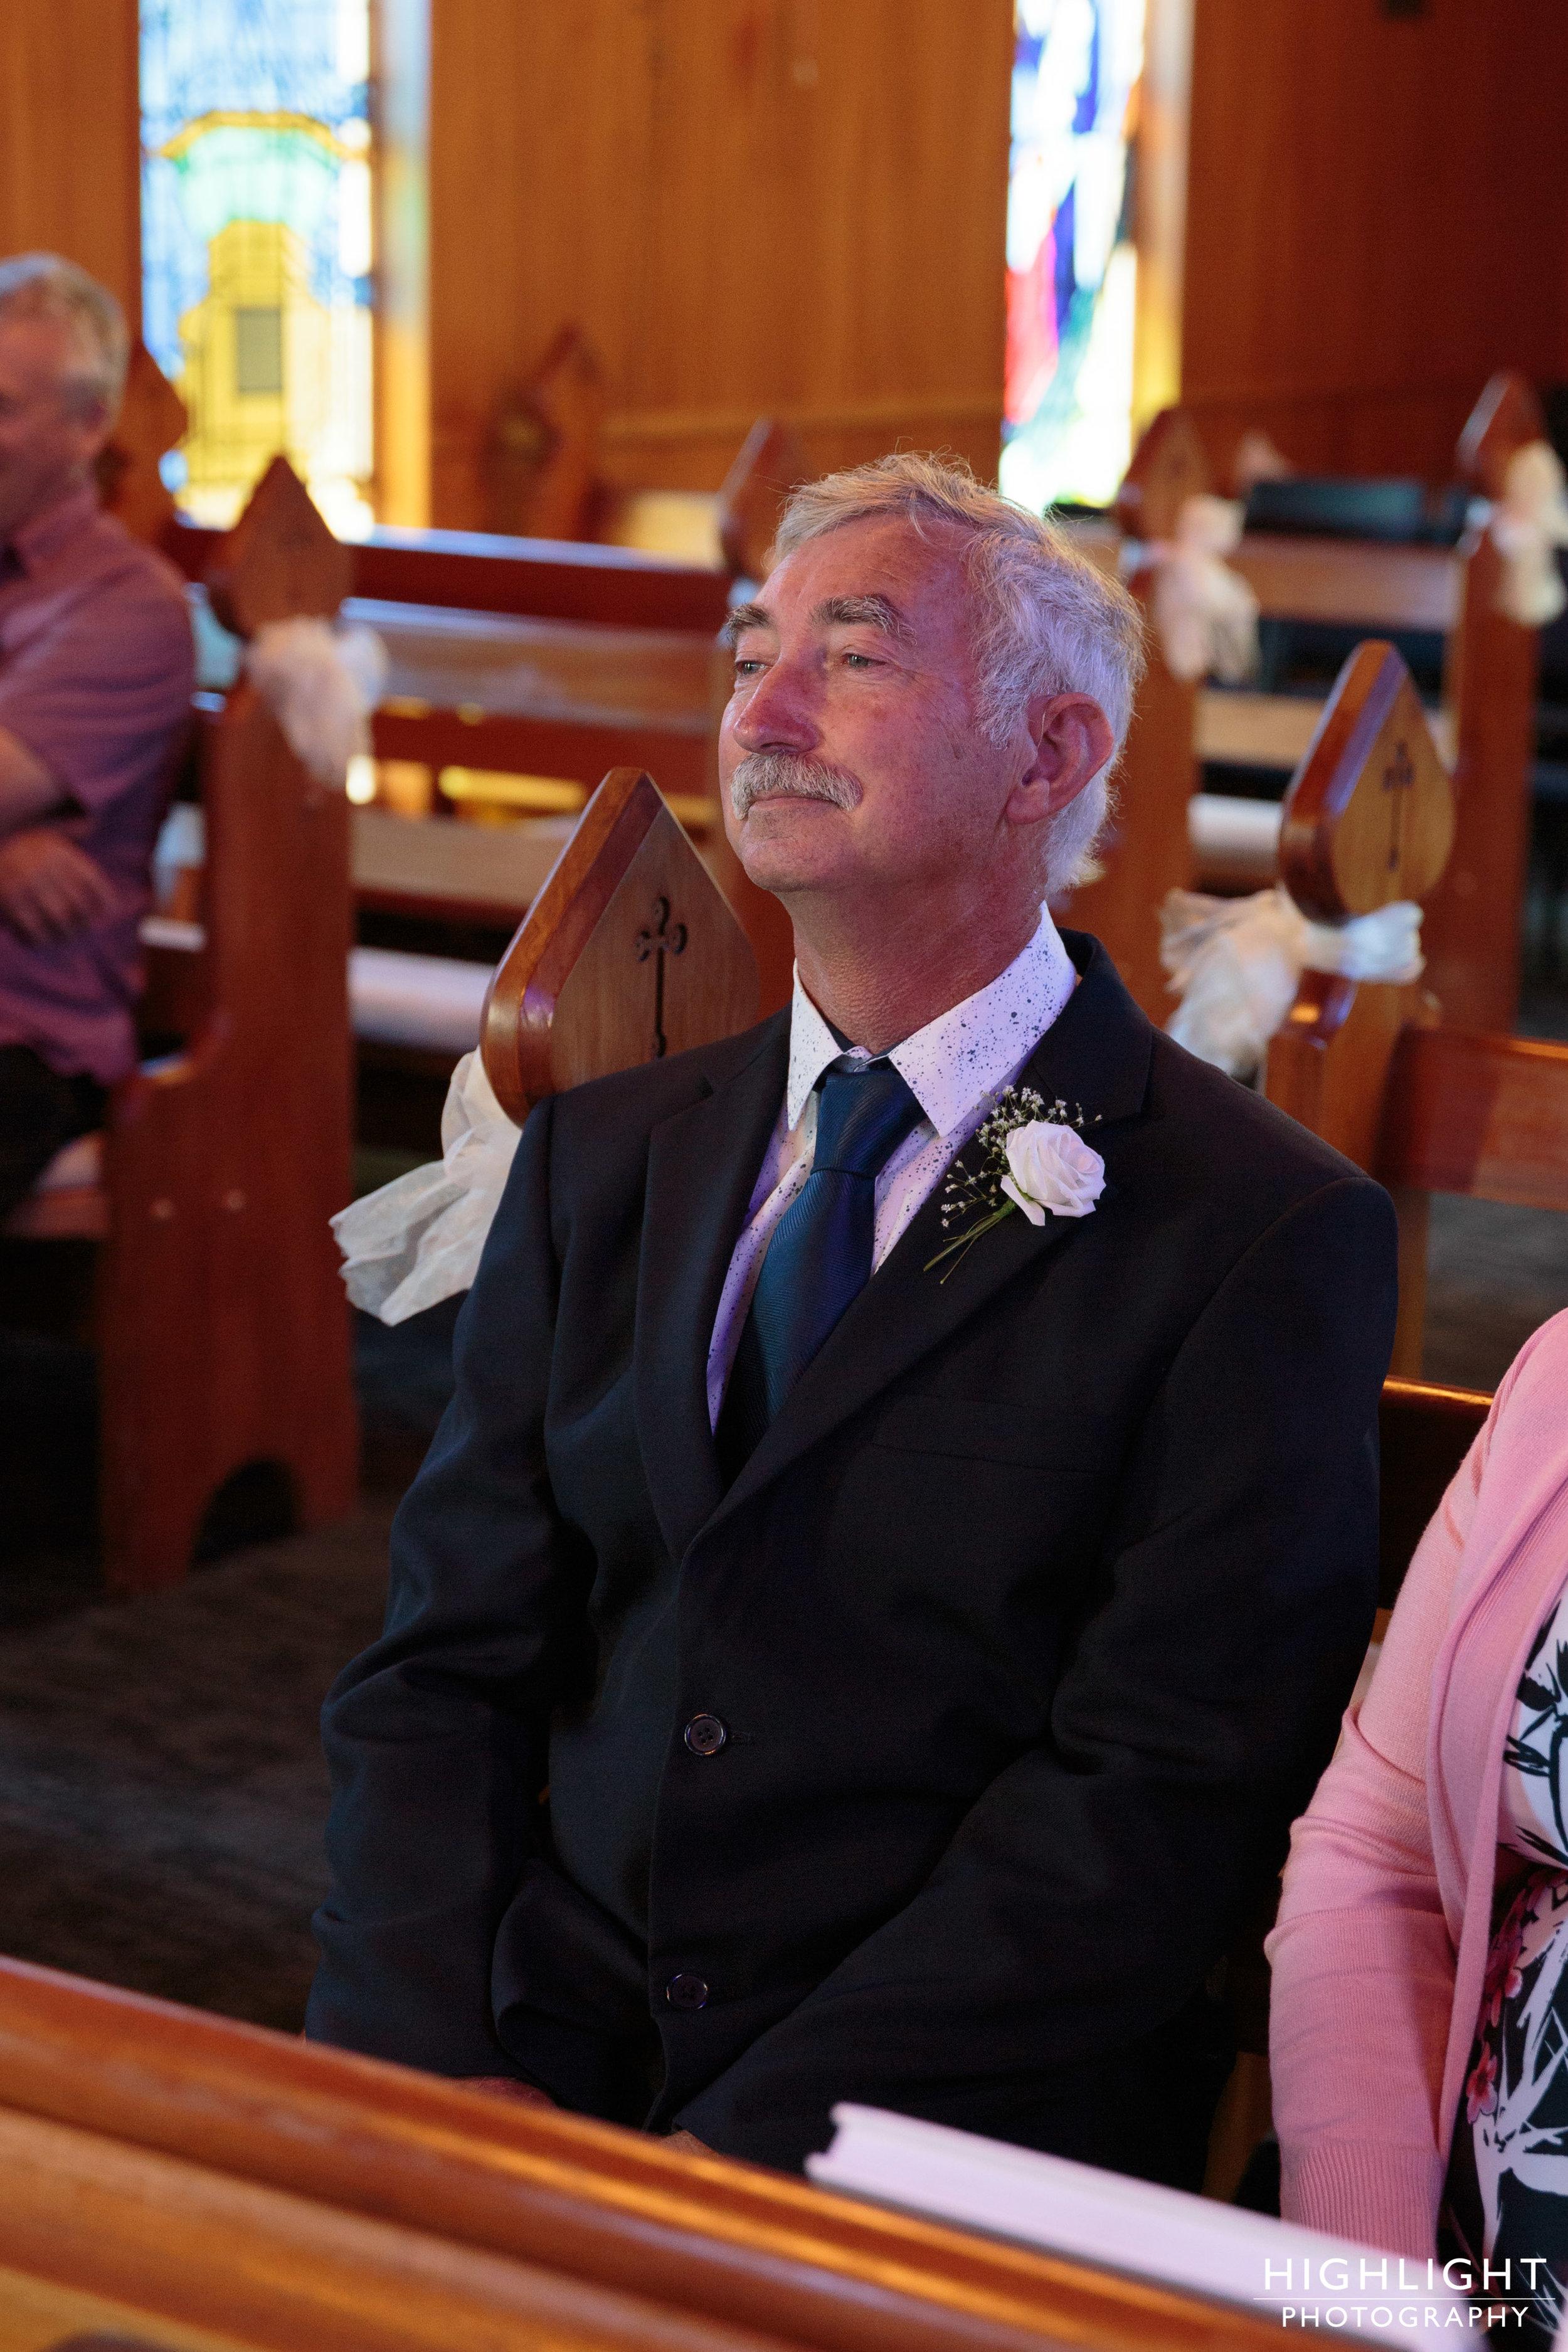 JM-2017-Highlight-wedding-photography-palmerston-north-new-zealand-58.jpg